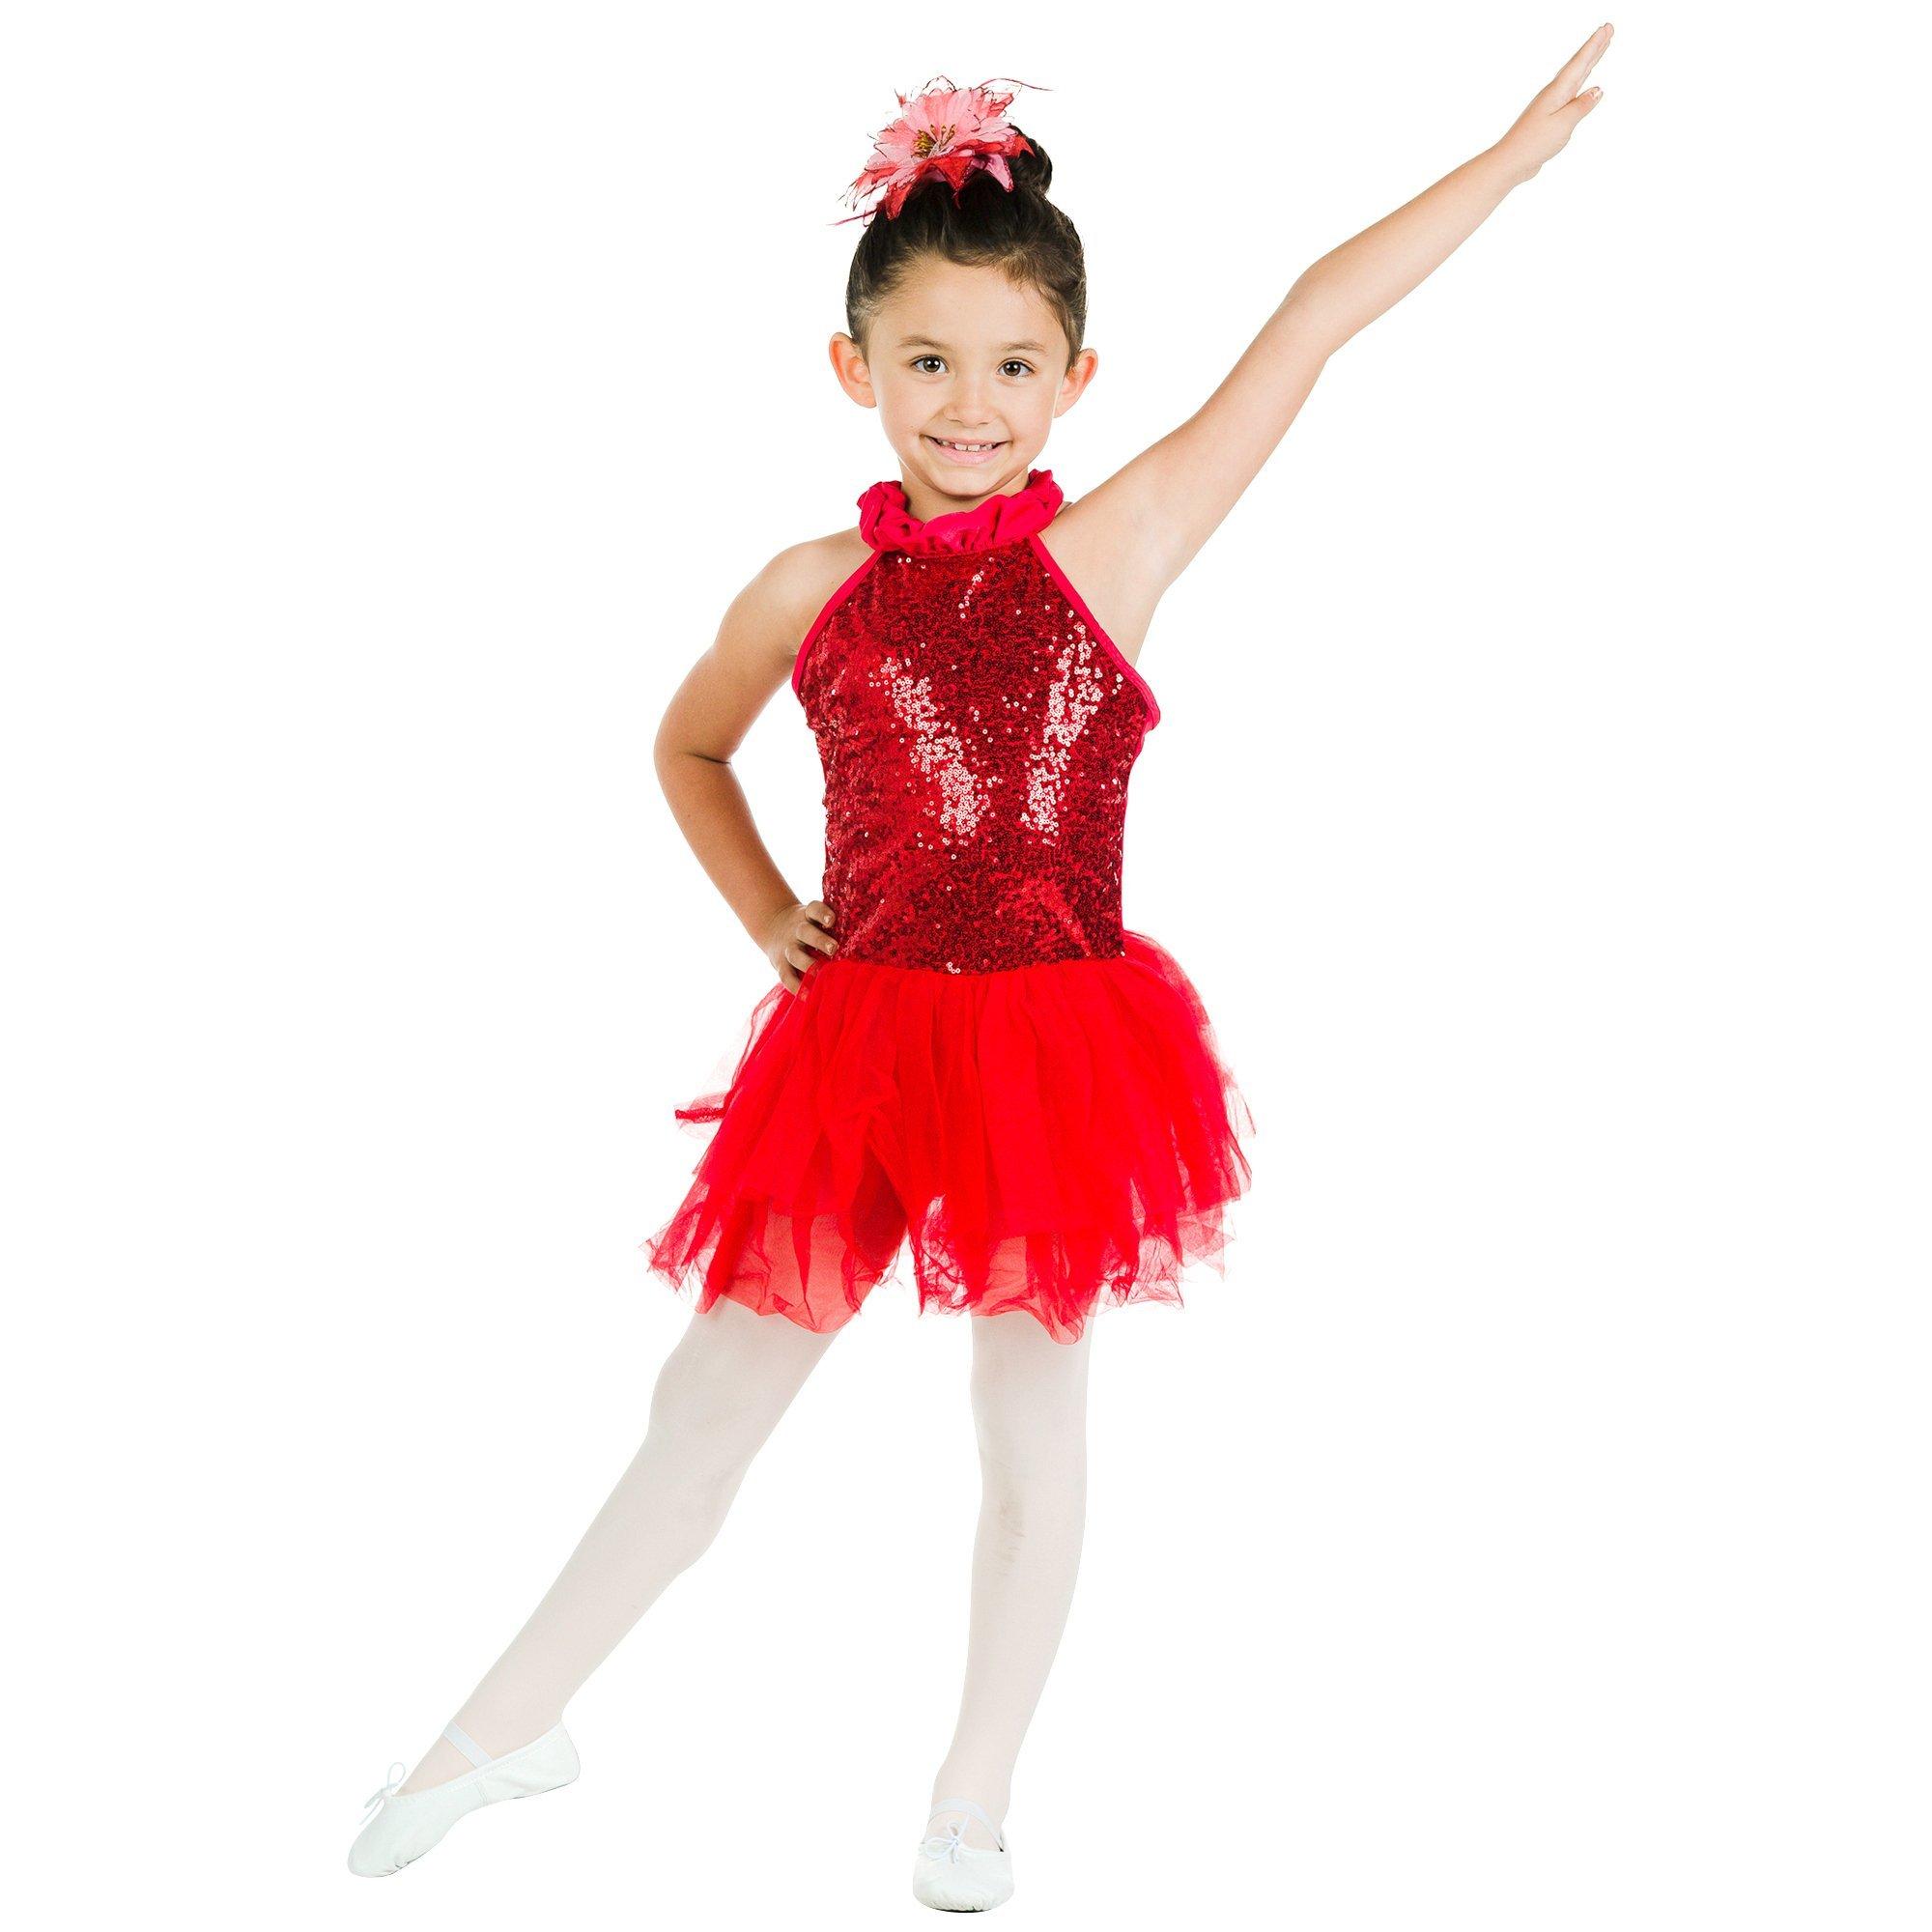 Danzcue Bright Red Sequin Dress